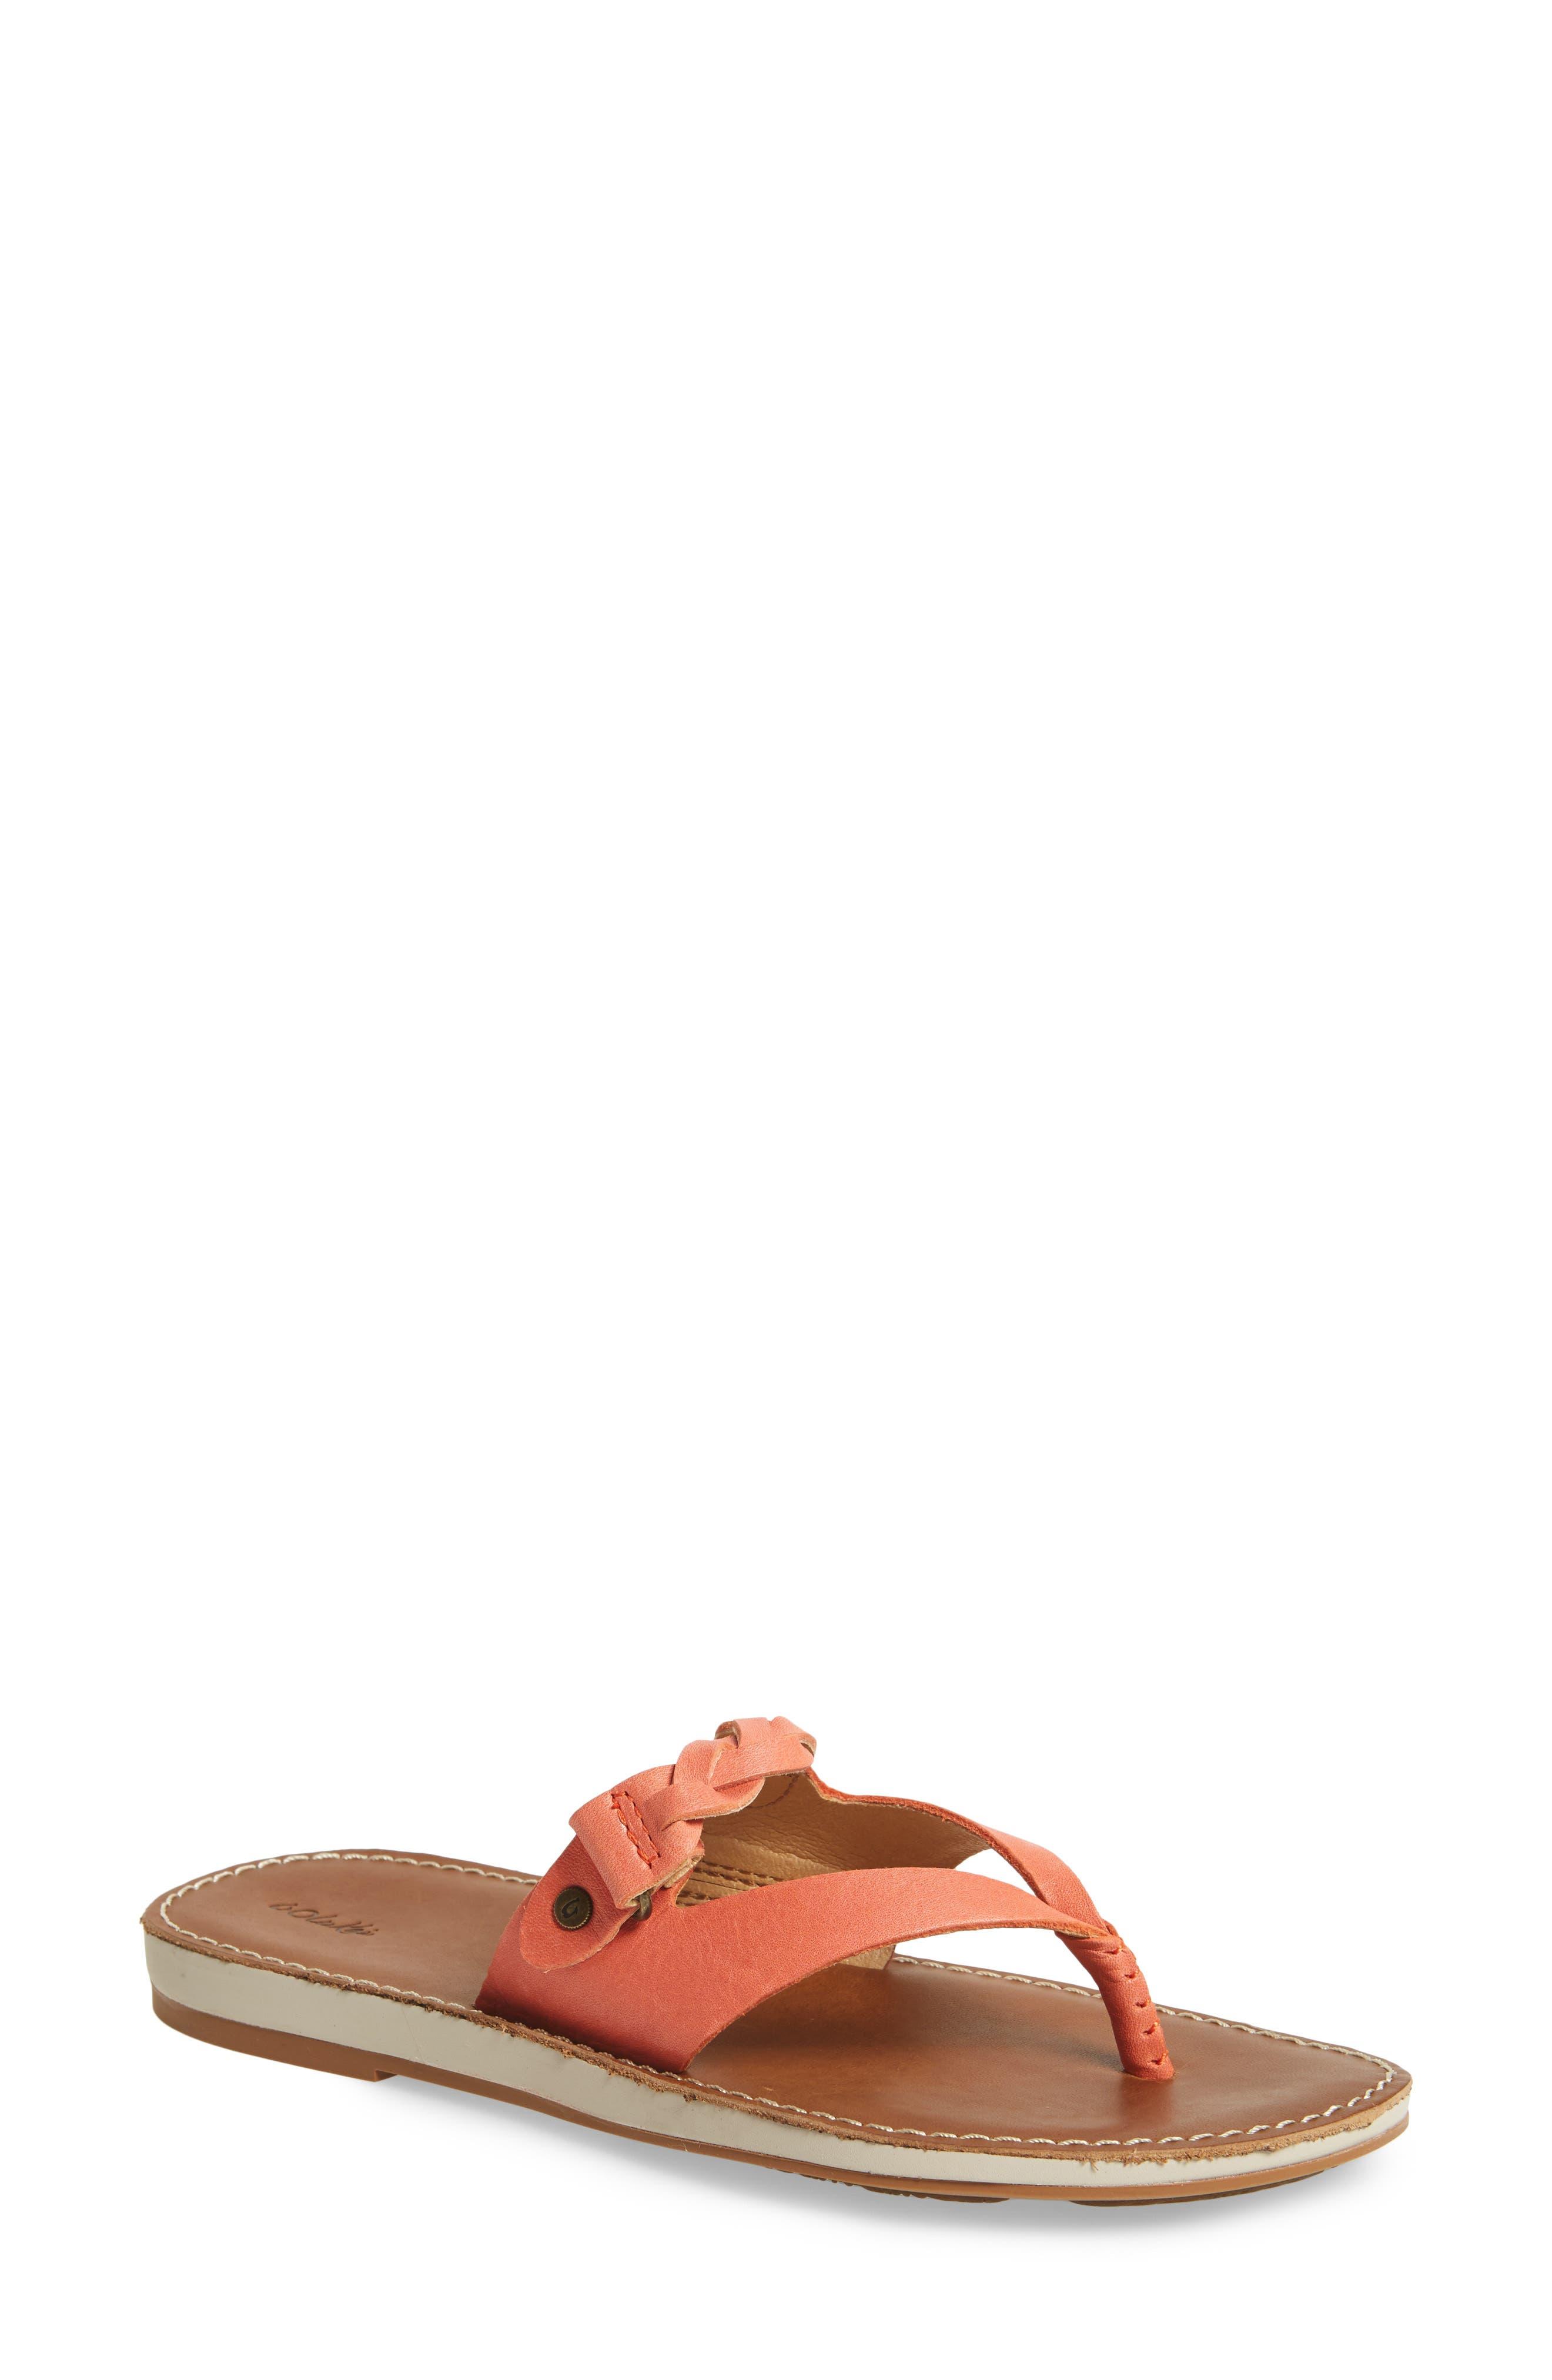 Kahikolu Flip Flop,                         Main,                         color, Peach/ Tan Leather